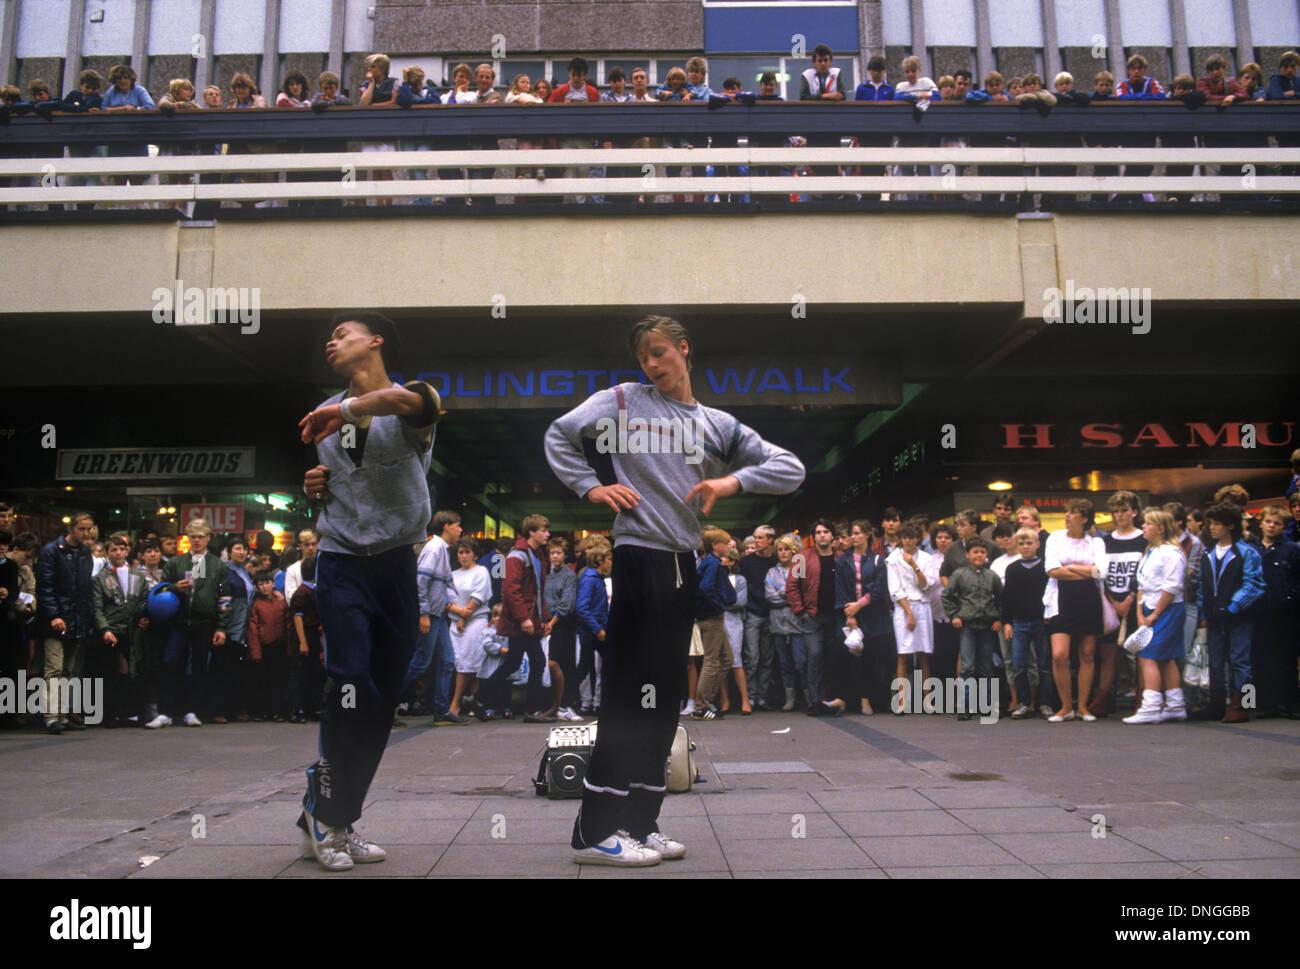 Le break dance Stockport Lancashire. 1980 Angleterre Grande-bretagne HOMER SYKES Photo Stock